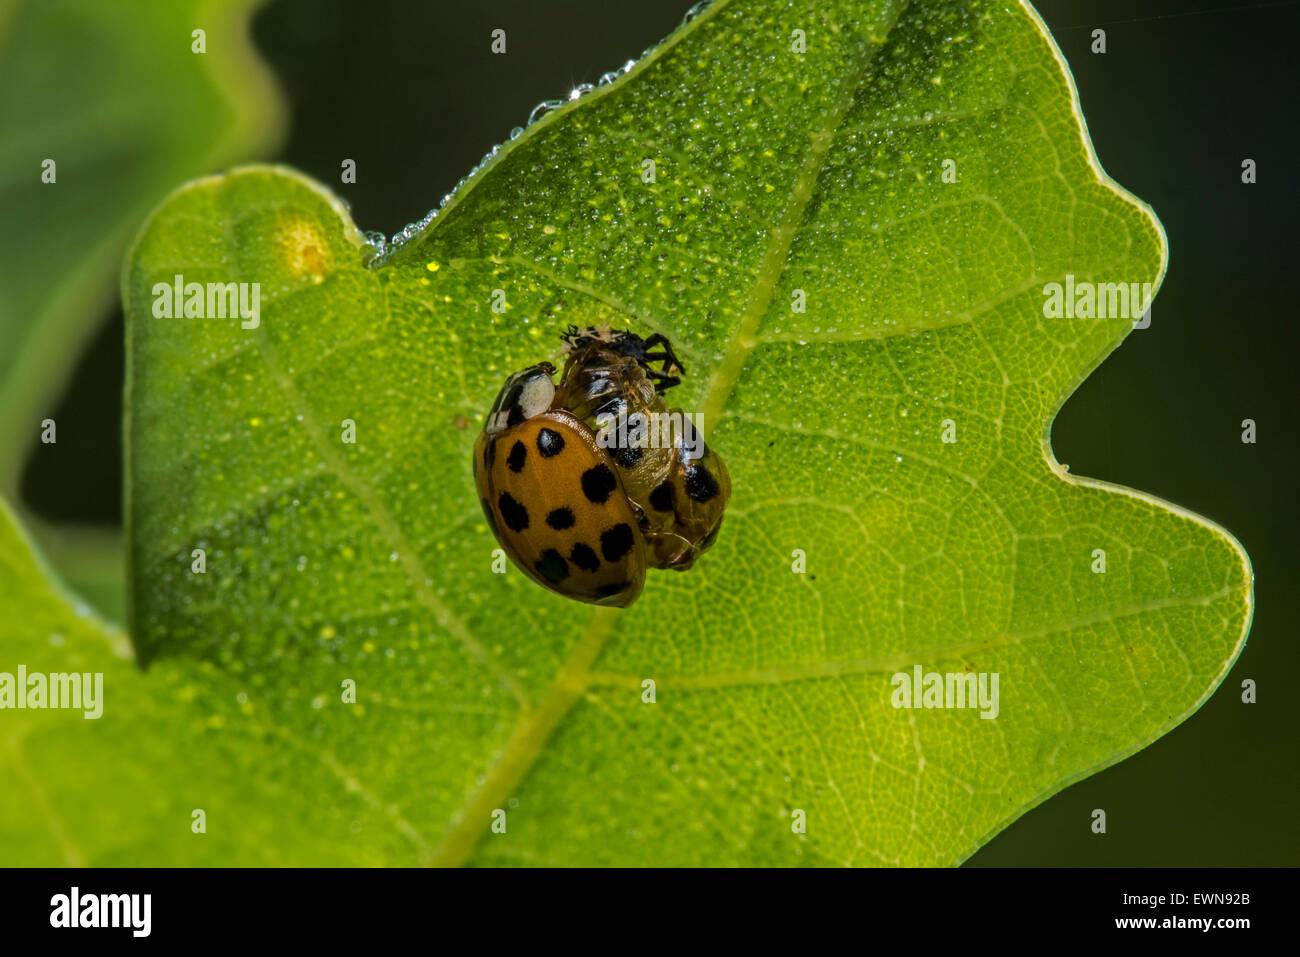 Harlequin ladybird / multicolored Asian lady beetle (Harmonia axyridis) emerged freshly out of its pupa - Stock Image